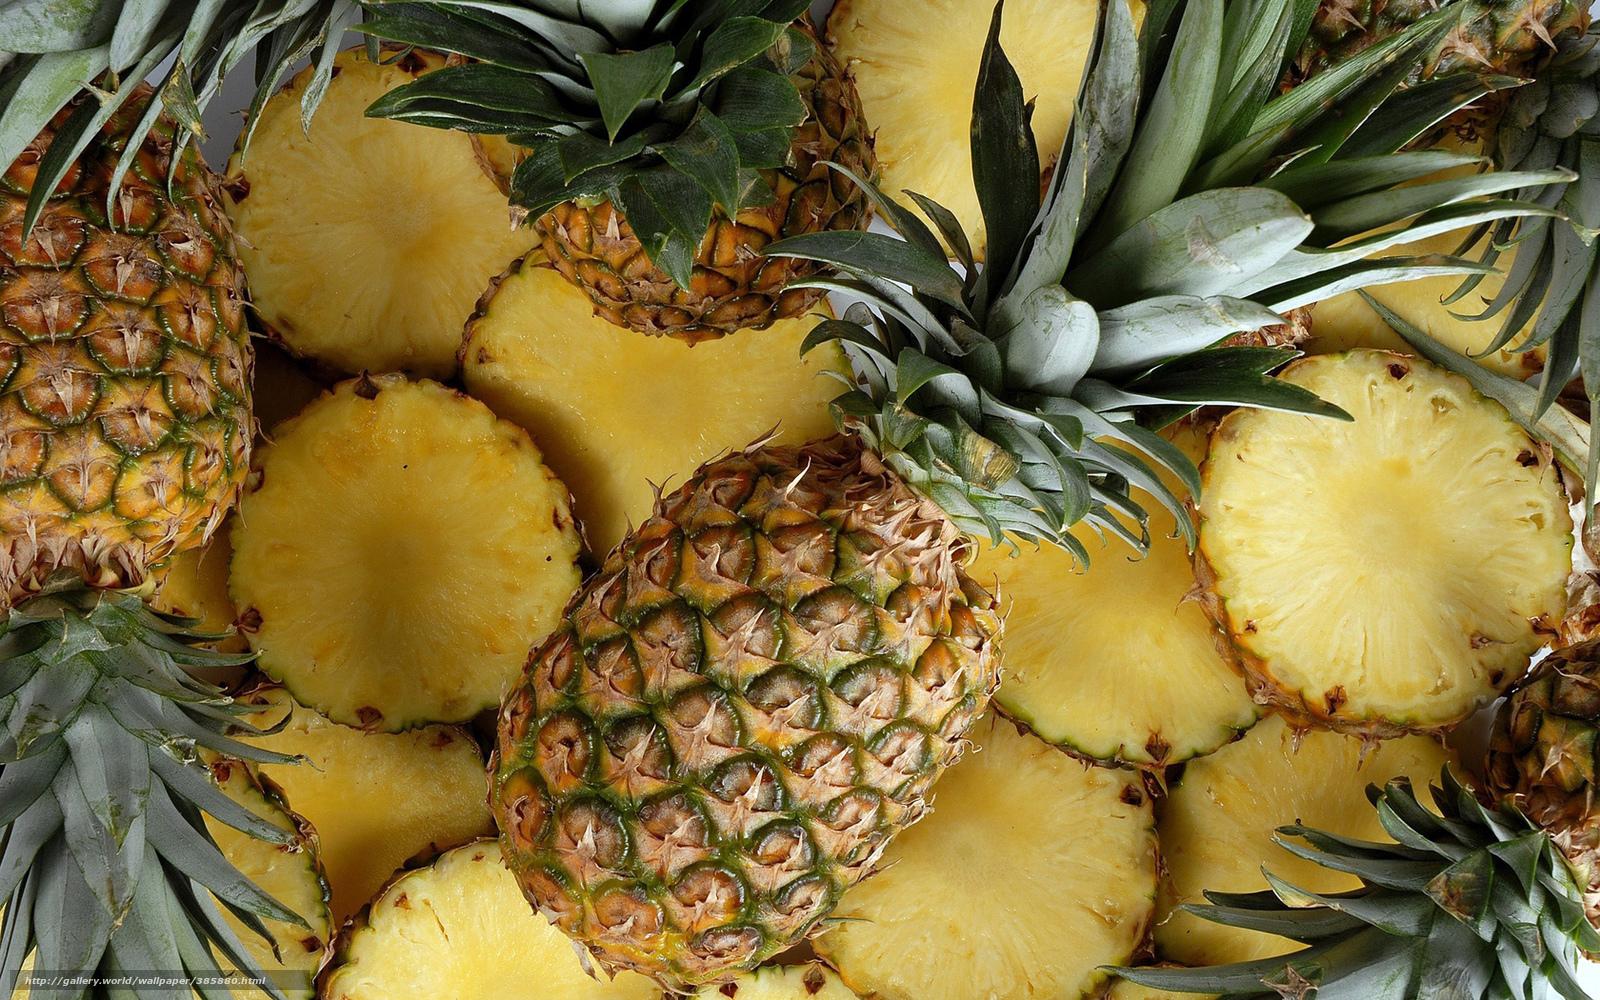 Tlcharger fond d 39 ecran fond ananas fruit jaune fonds d for Fond ecran ananas